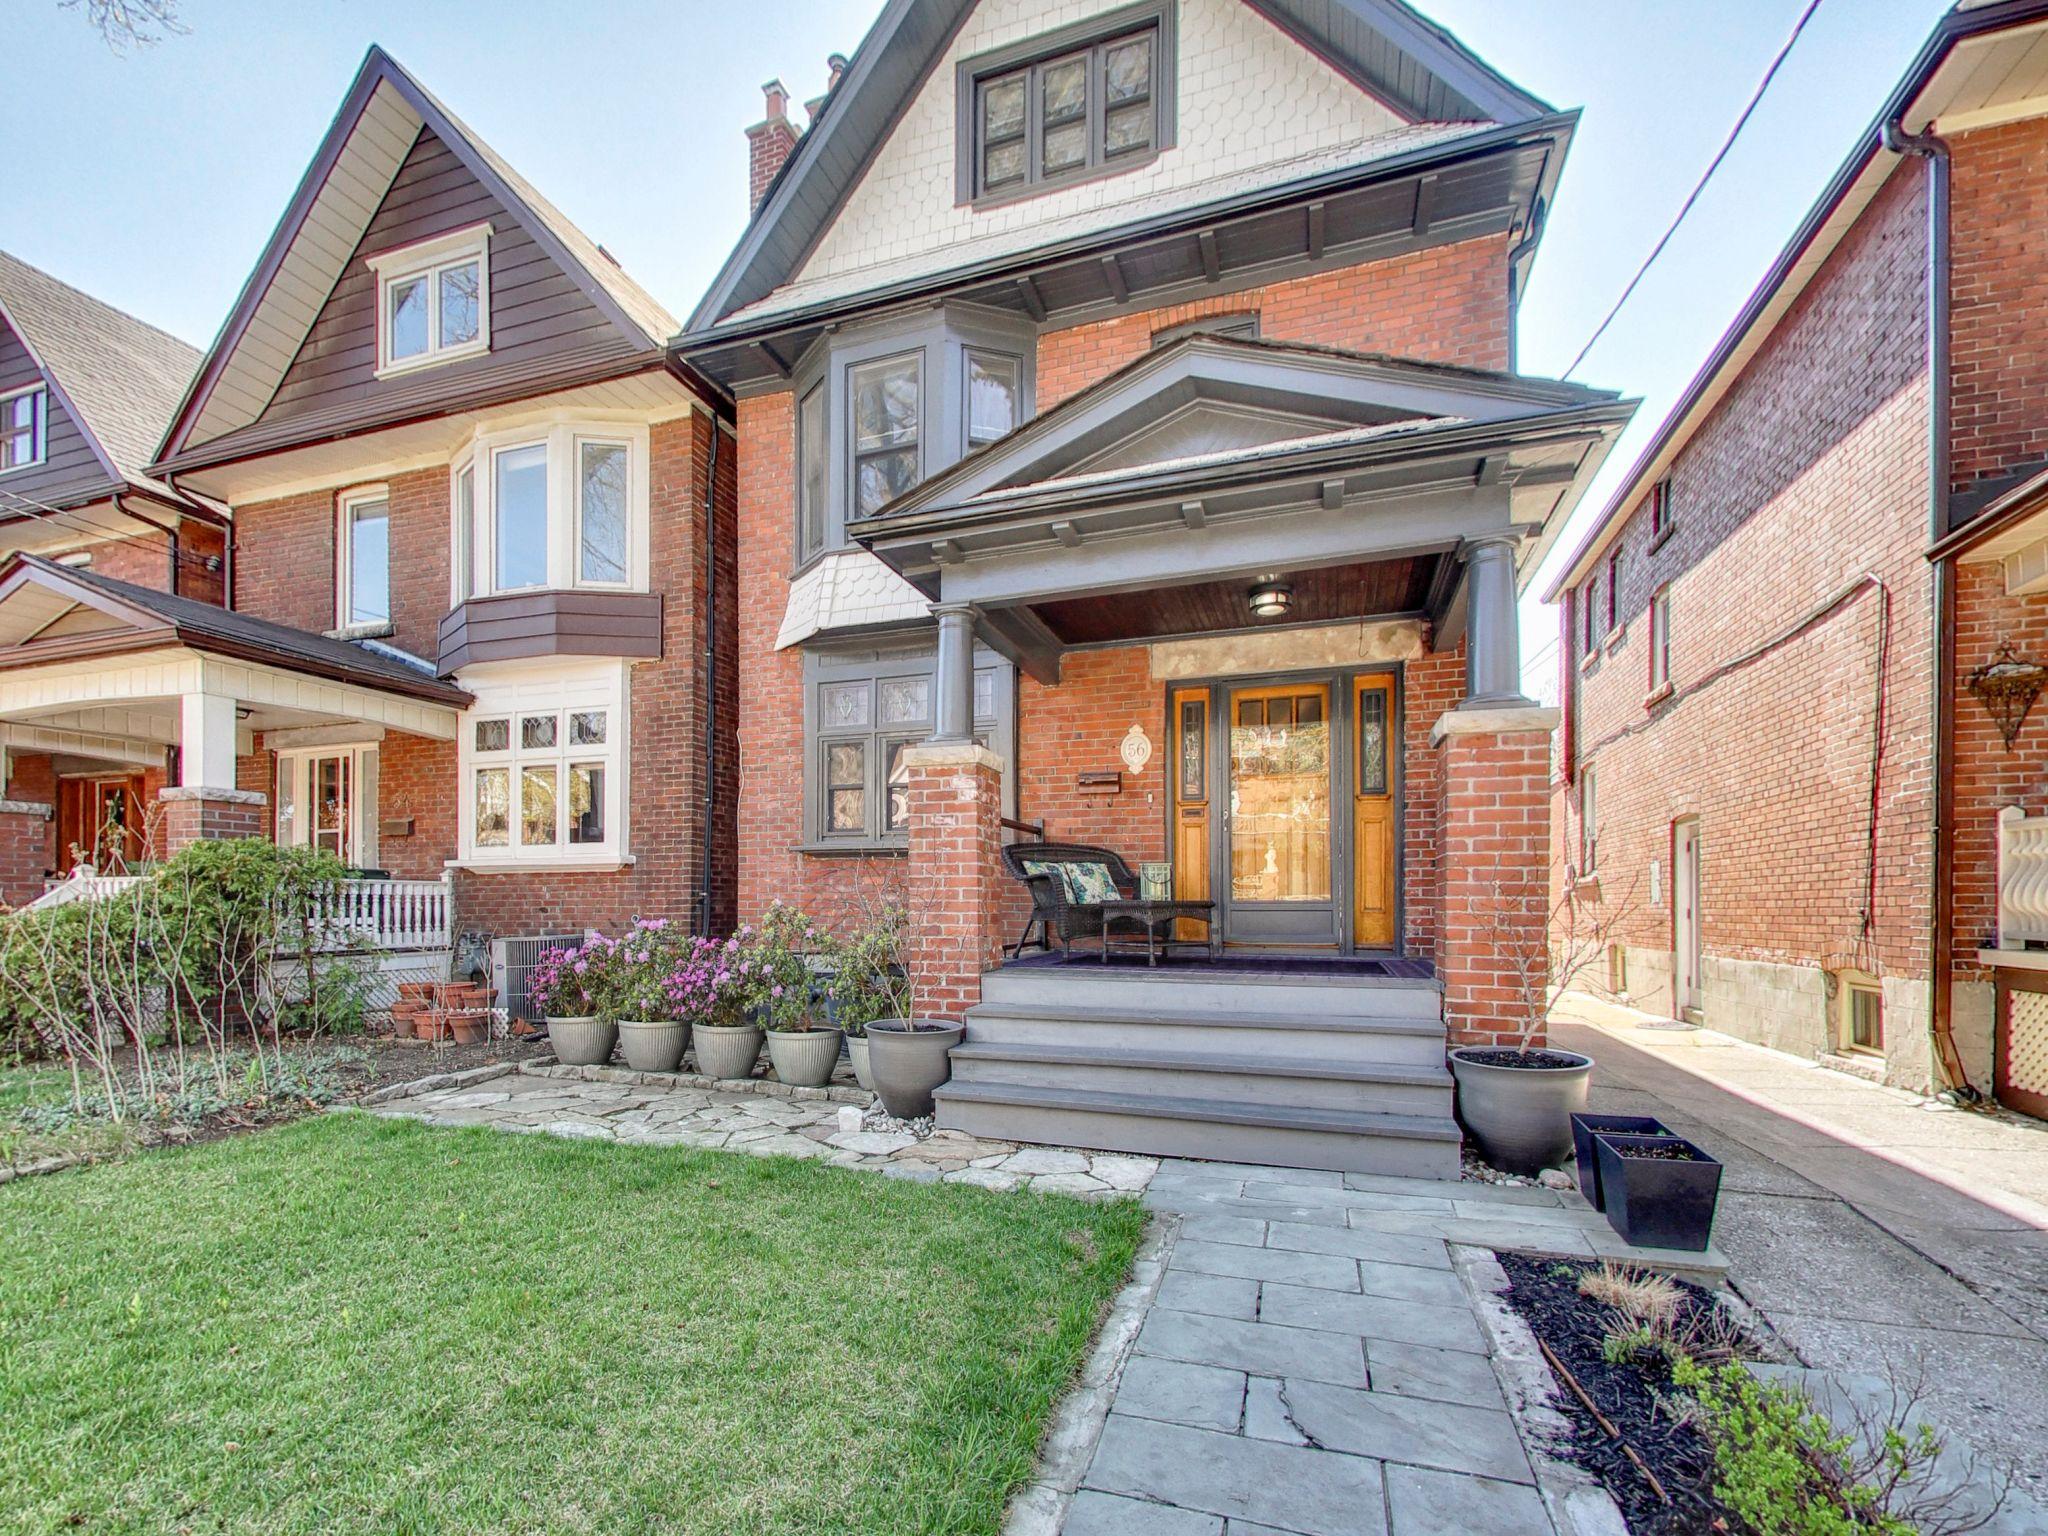 Buying Rental Property In Ontario Good Or Bad